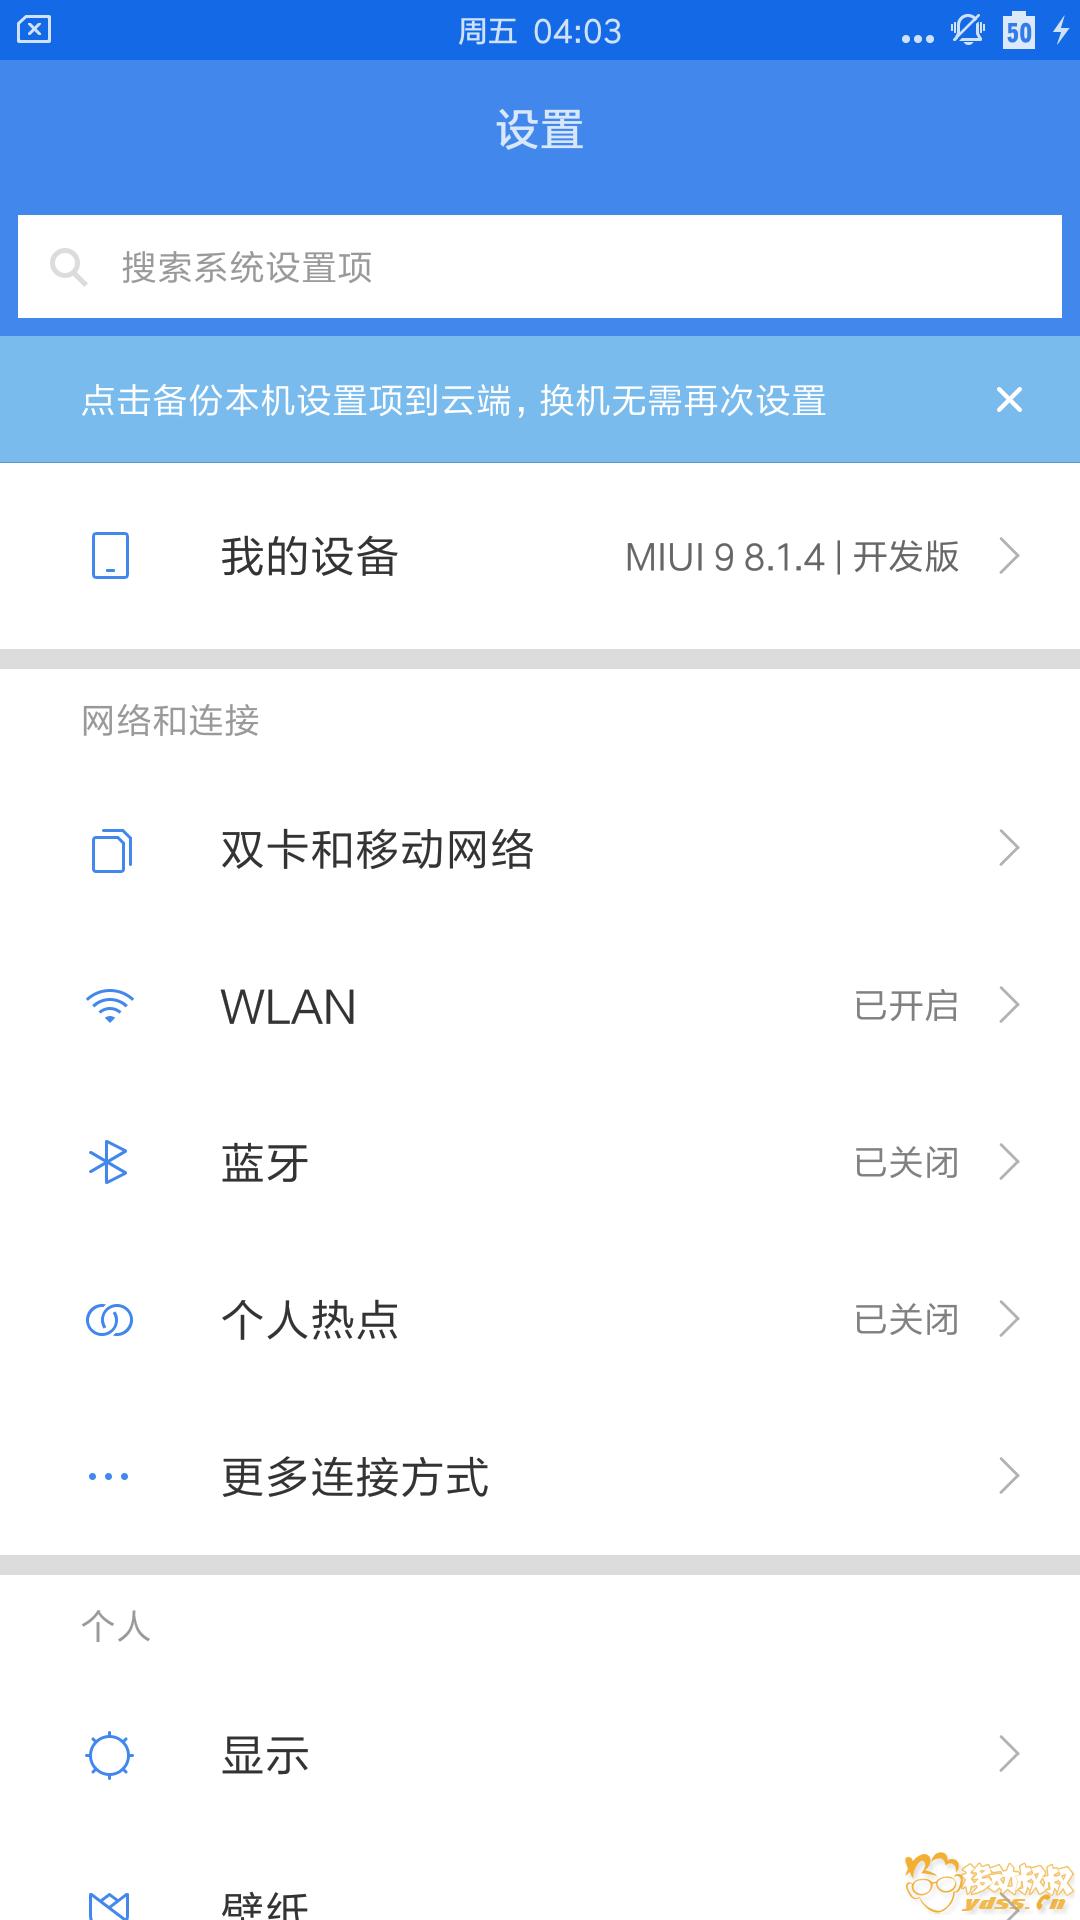 Screenshot_2018-01-05-16-03-03-153_com.android.settings.png